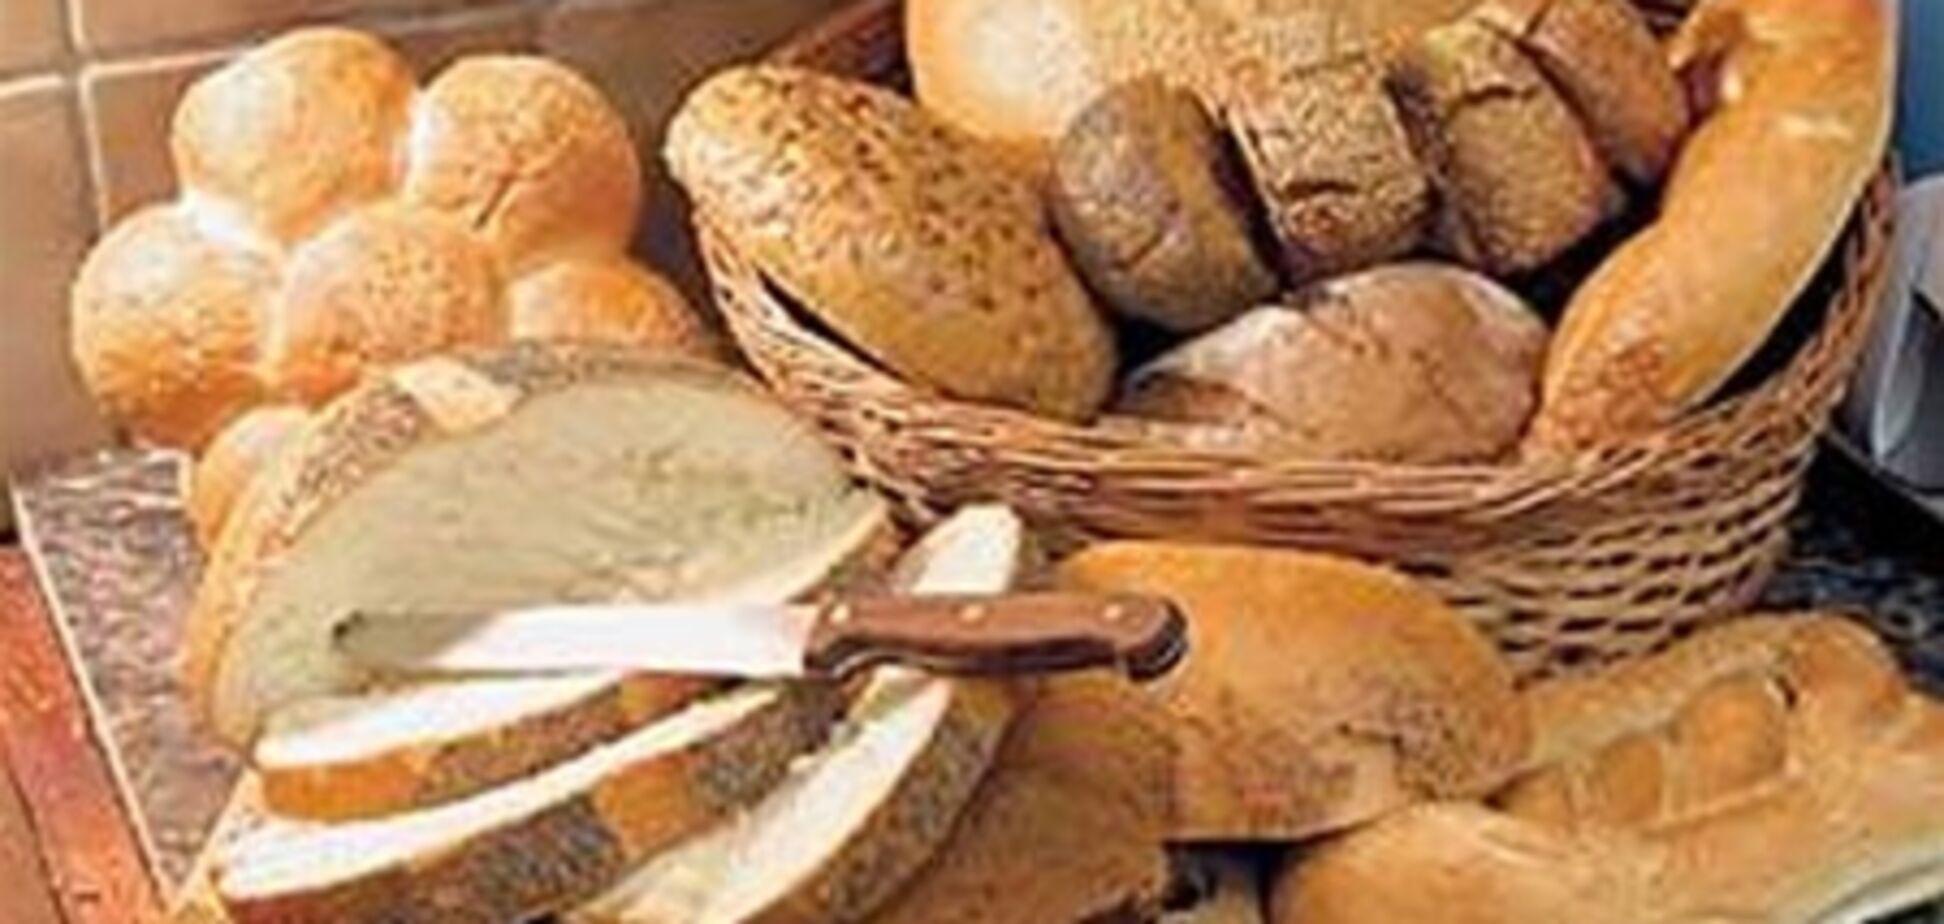 Возбуждено уголовное дело из-за нехватки хлеба на Луганщине